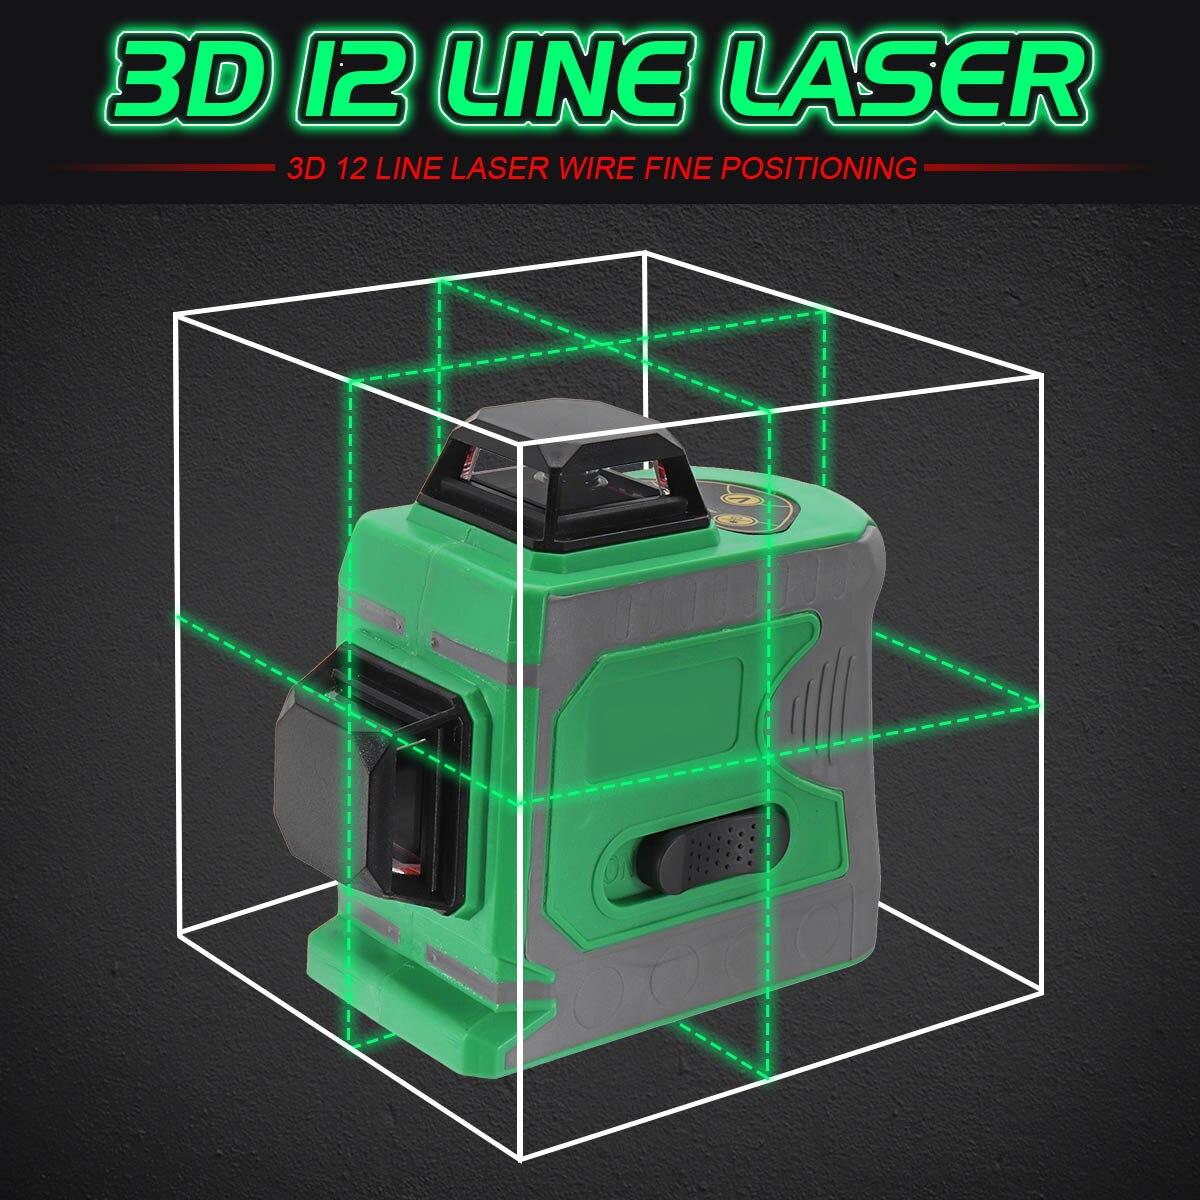 [SCHEMATICS_4US]  Laser Level 3D 12 Line Green Light Auto Self Leveling 360 Rotary Measure  Horizontal Vertical Cross Self Leveling 635nm Stability|Laser Levels| -  AliExpress | Laser Level 360 Wire Diagram |  | www.aliexpress.com